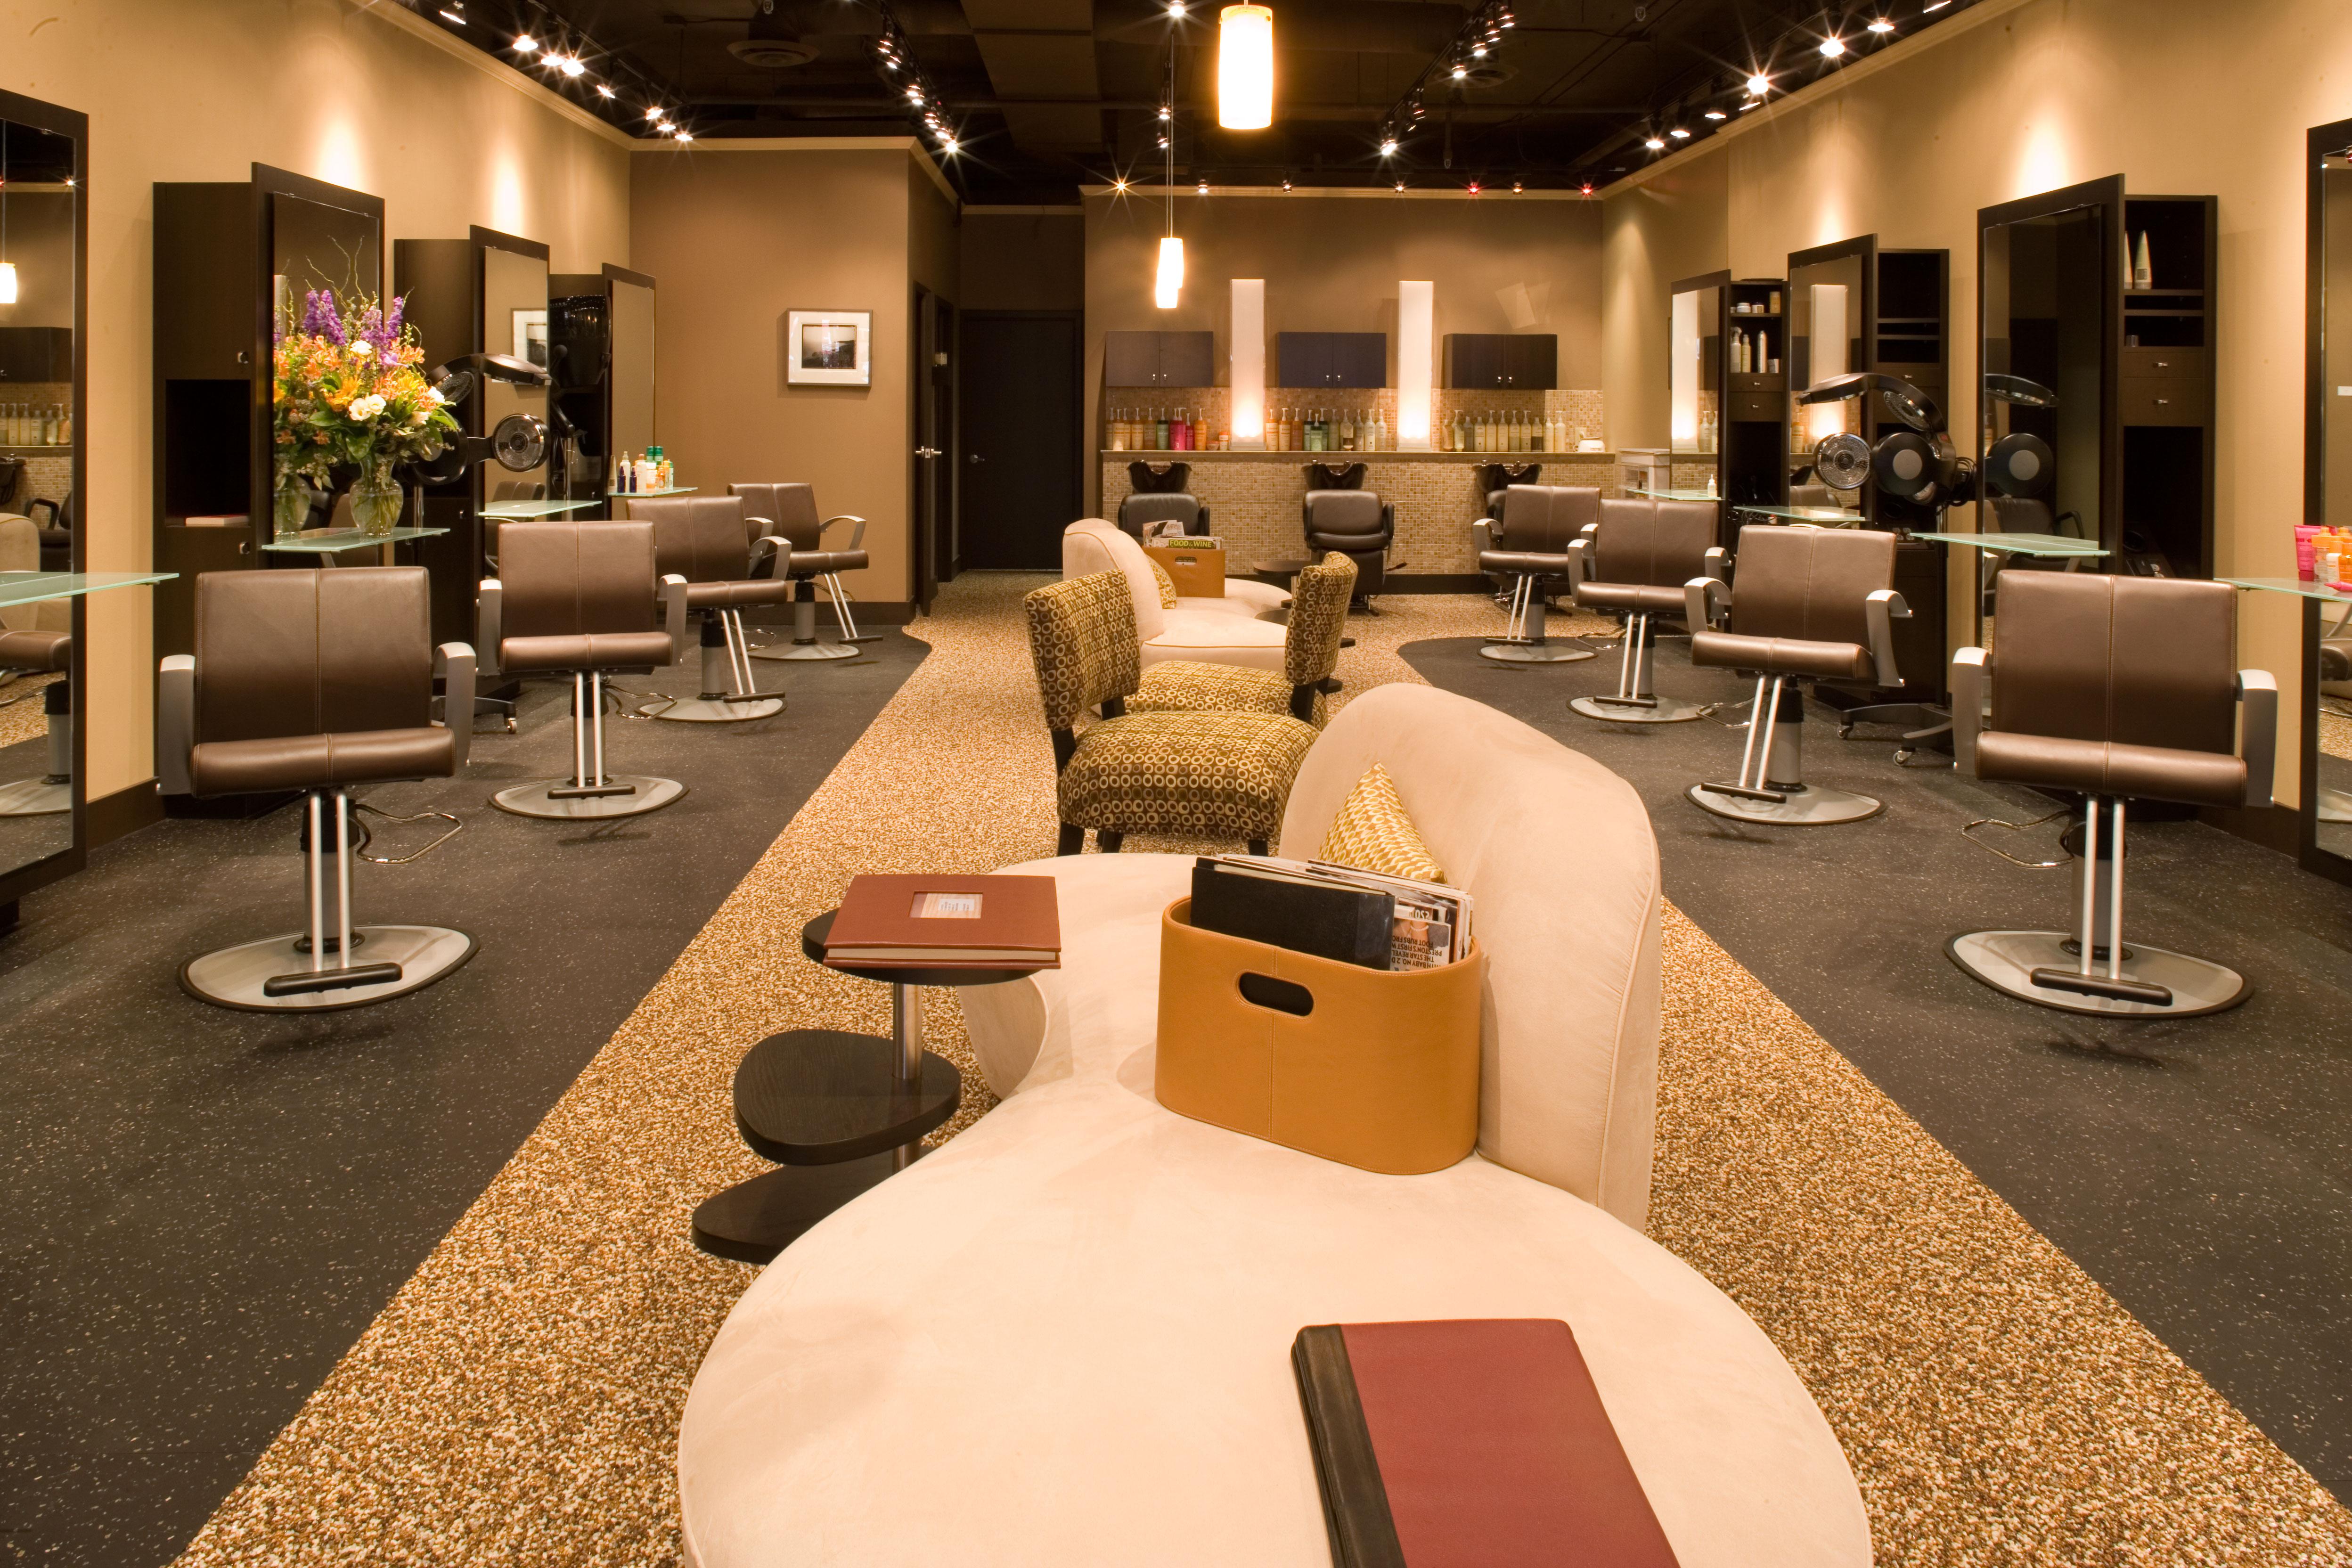 Tres jolie salon remodel minneapolis mn 55405 randahl for Salon construction